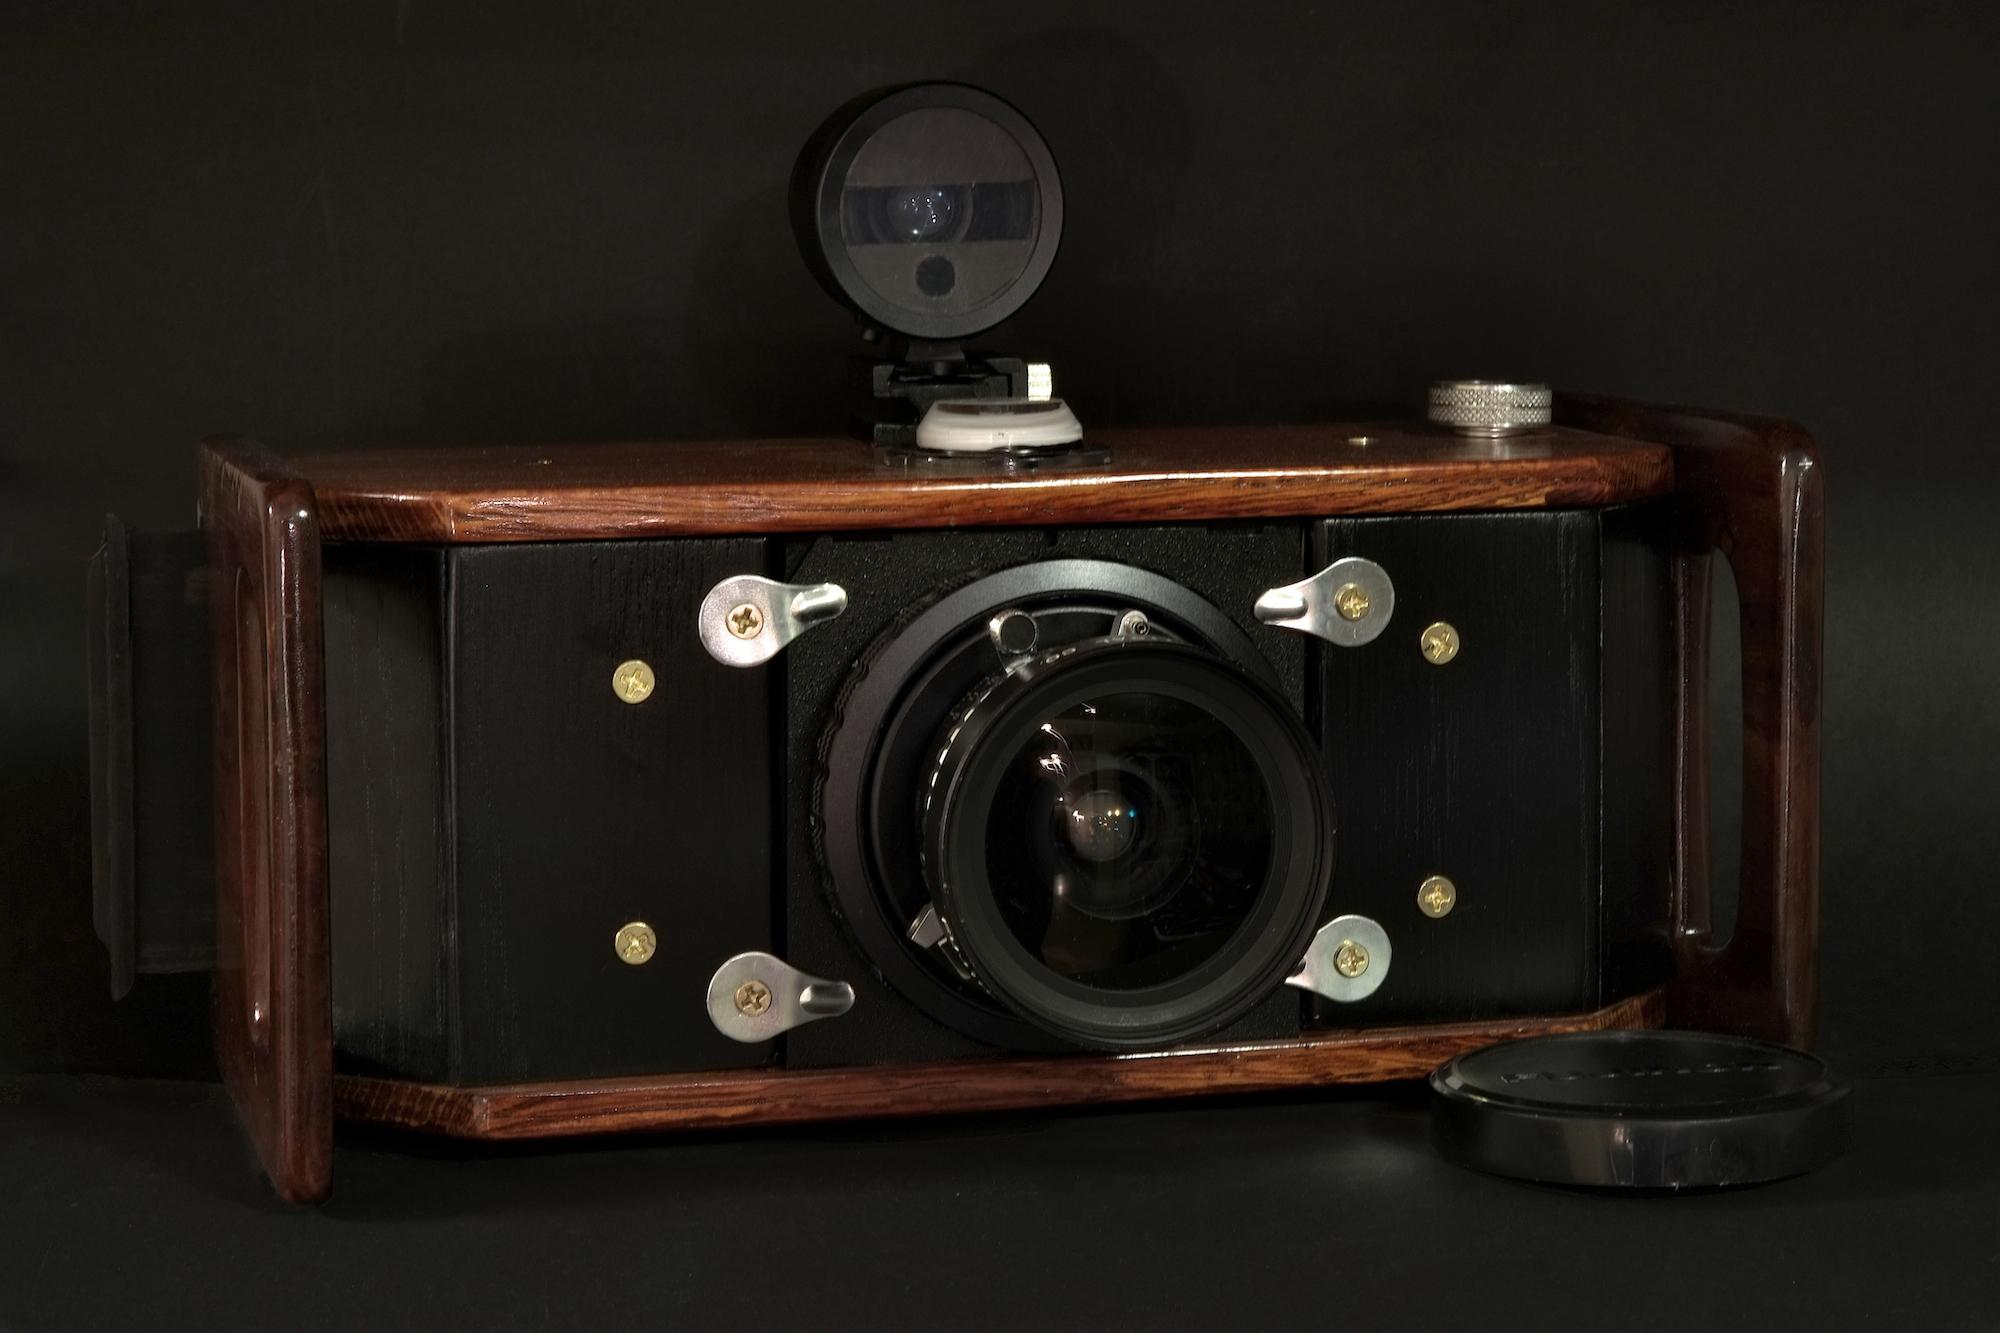 Eirik Russel Roberts DIY 6x17 Camera